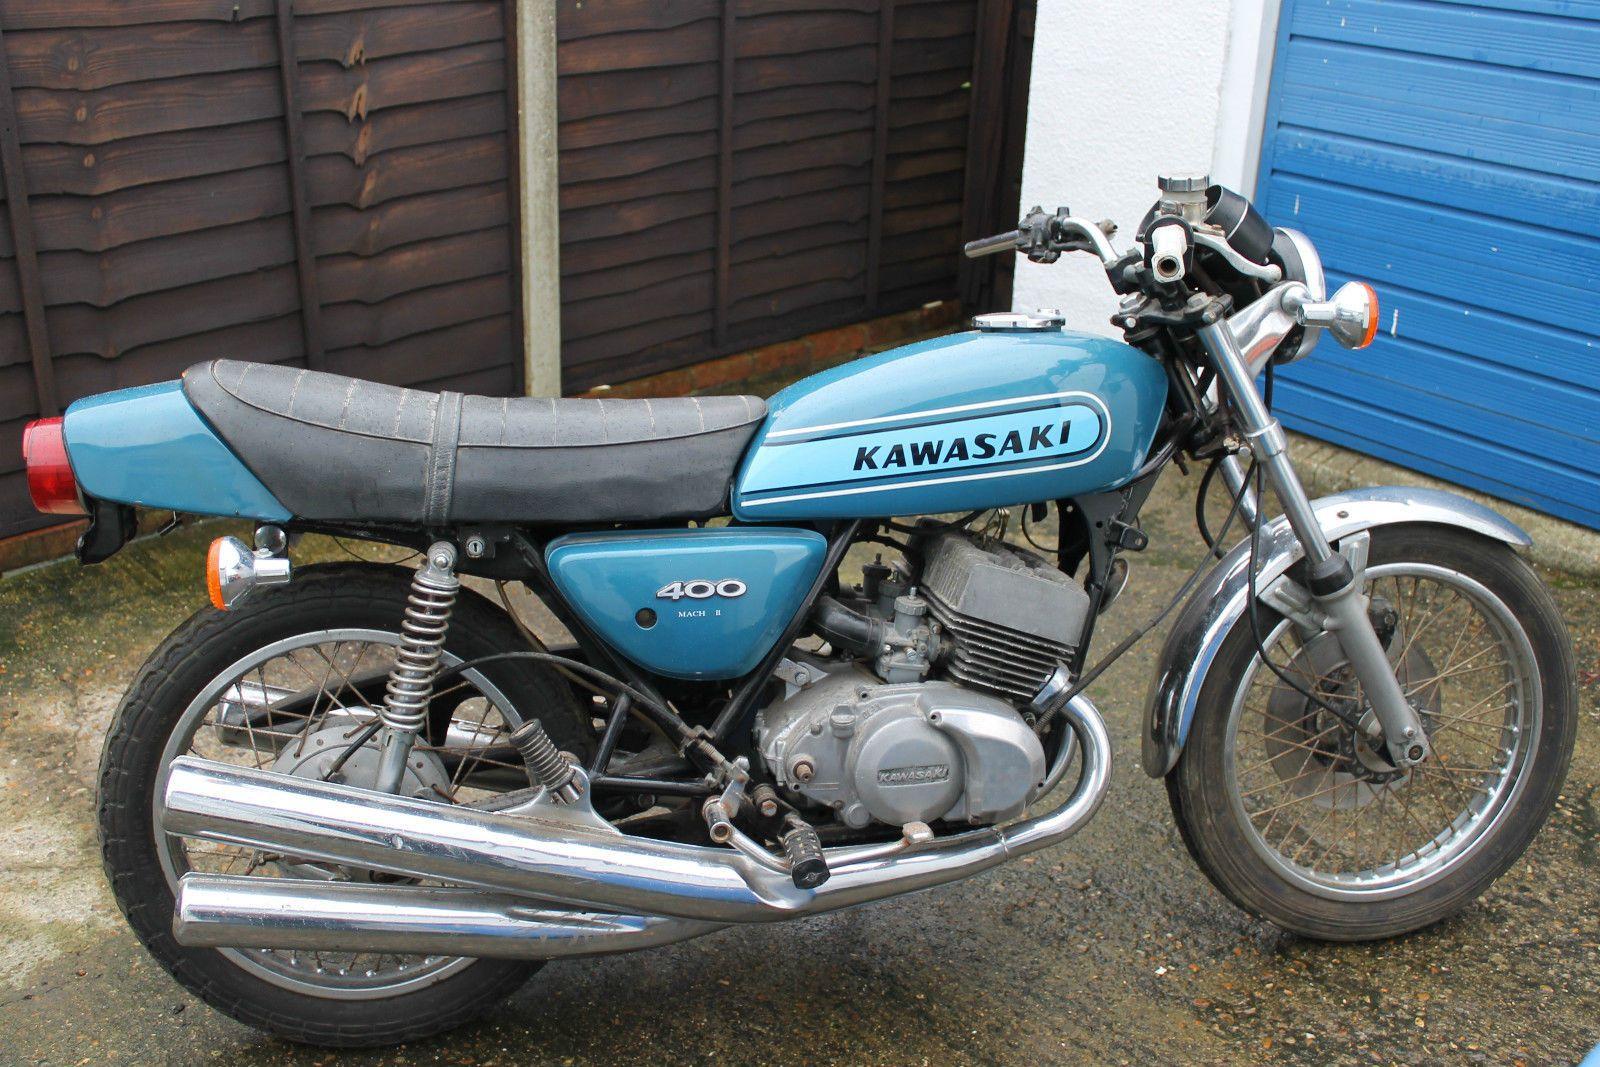 Details about 1975 Kawasaki KH400 S3 Mach II, Original 2